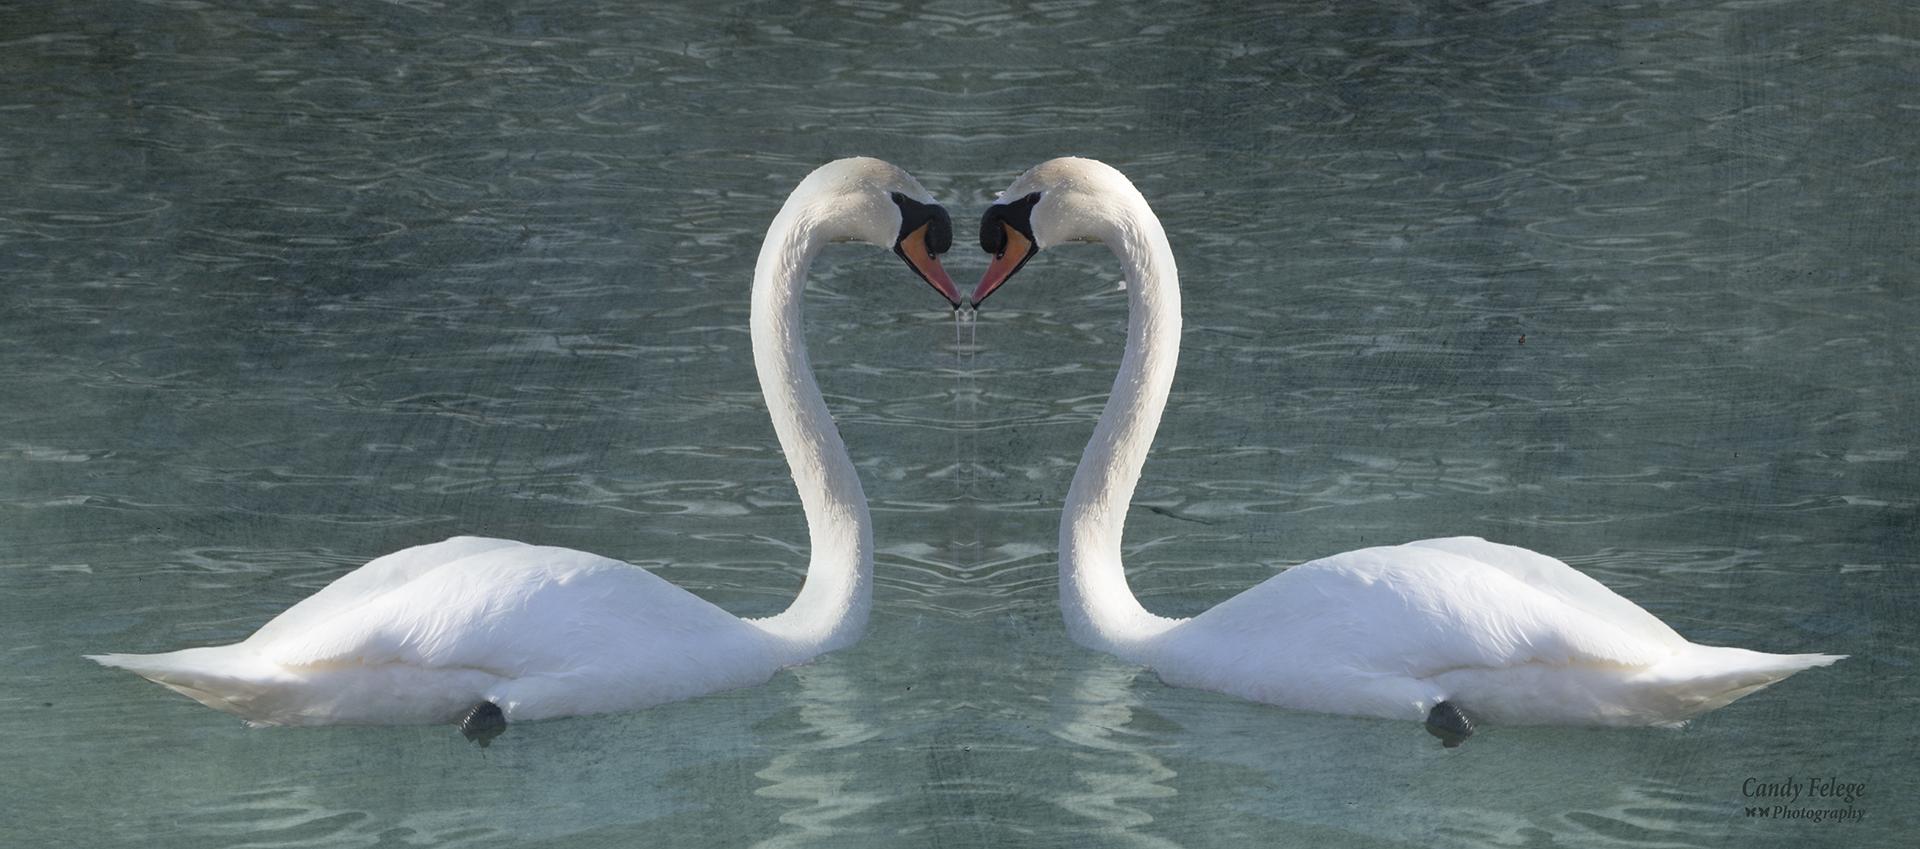 felege_swan's heart.jpg